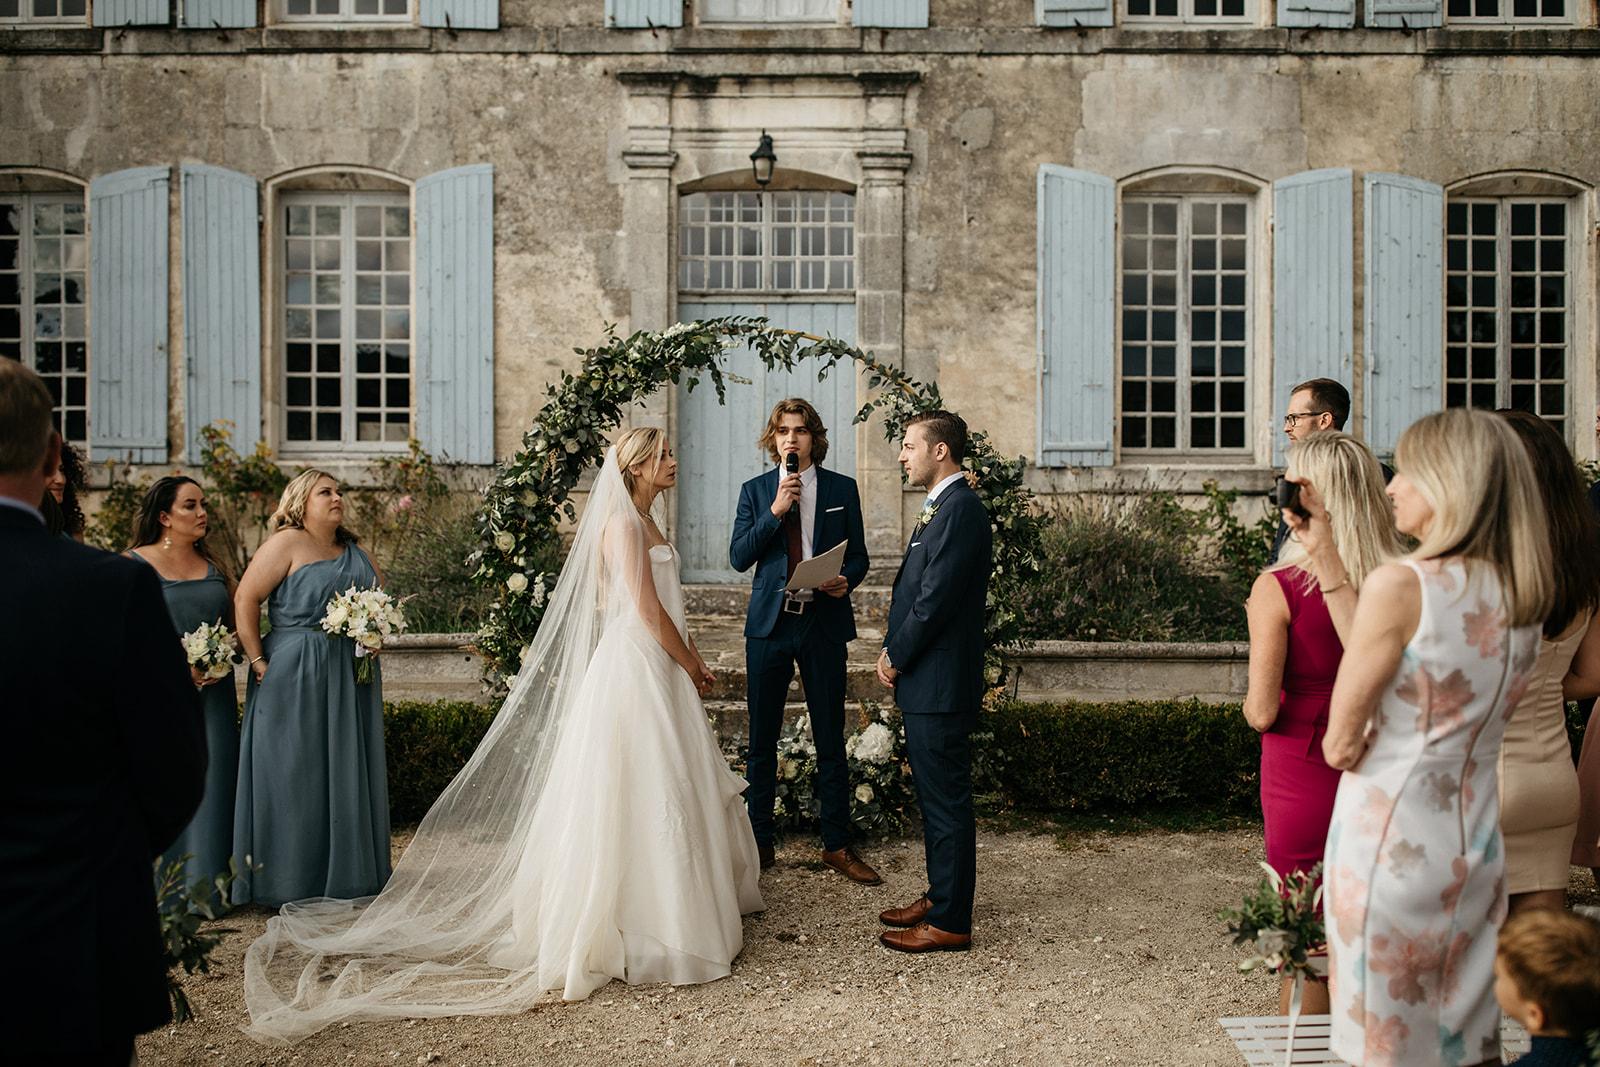 257-Madison-Joren-Wedding-Jarnac-2018-IMG_5652.jpg